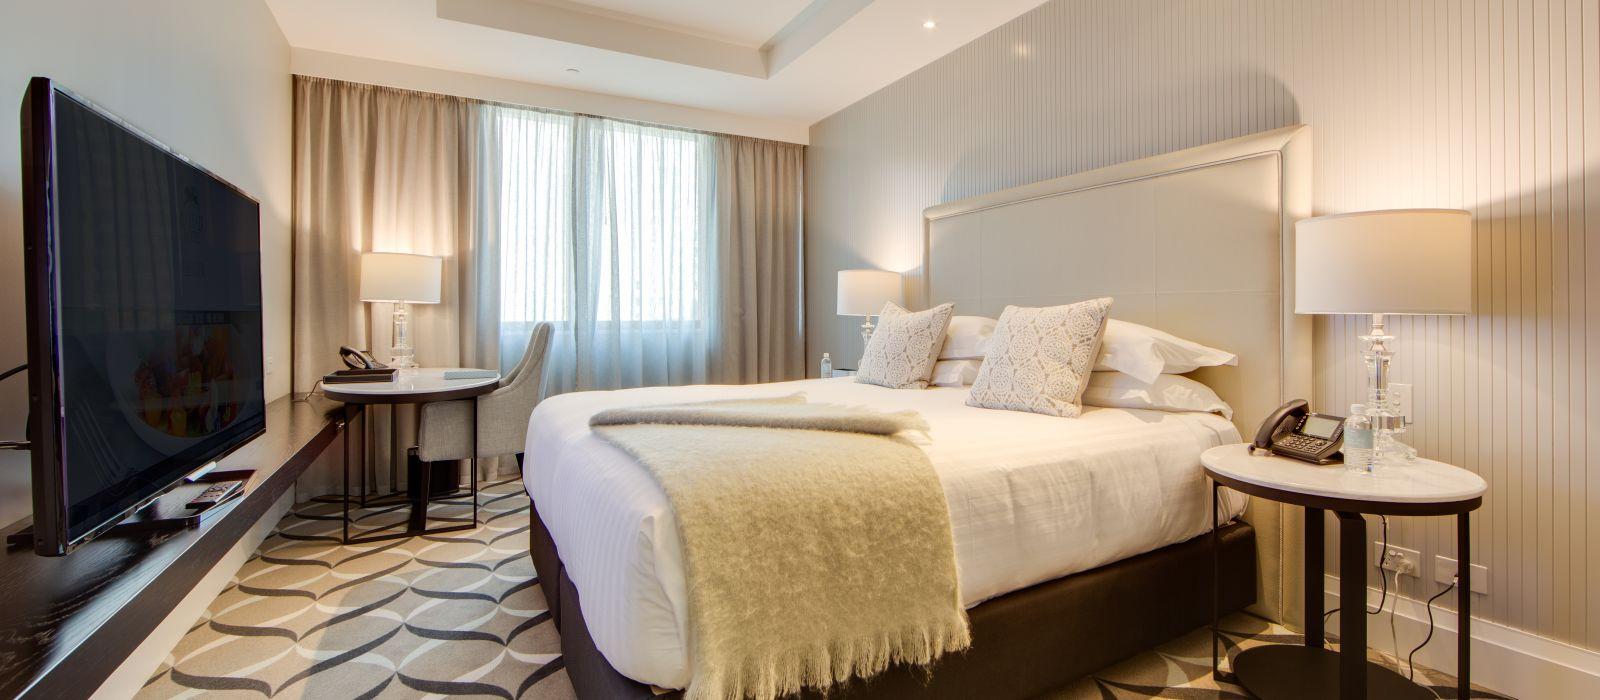 Hotel Mayfair  %region%